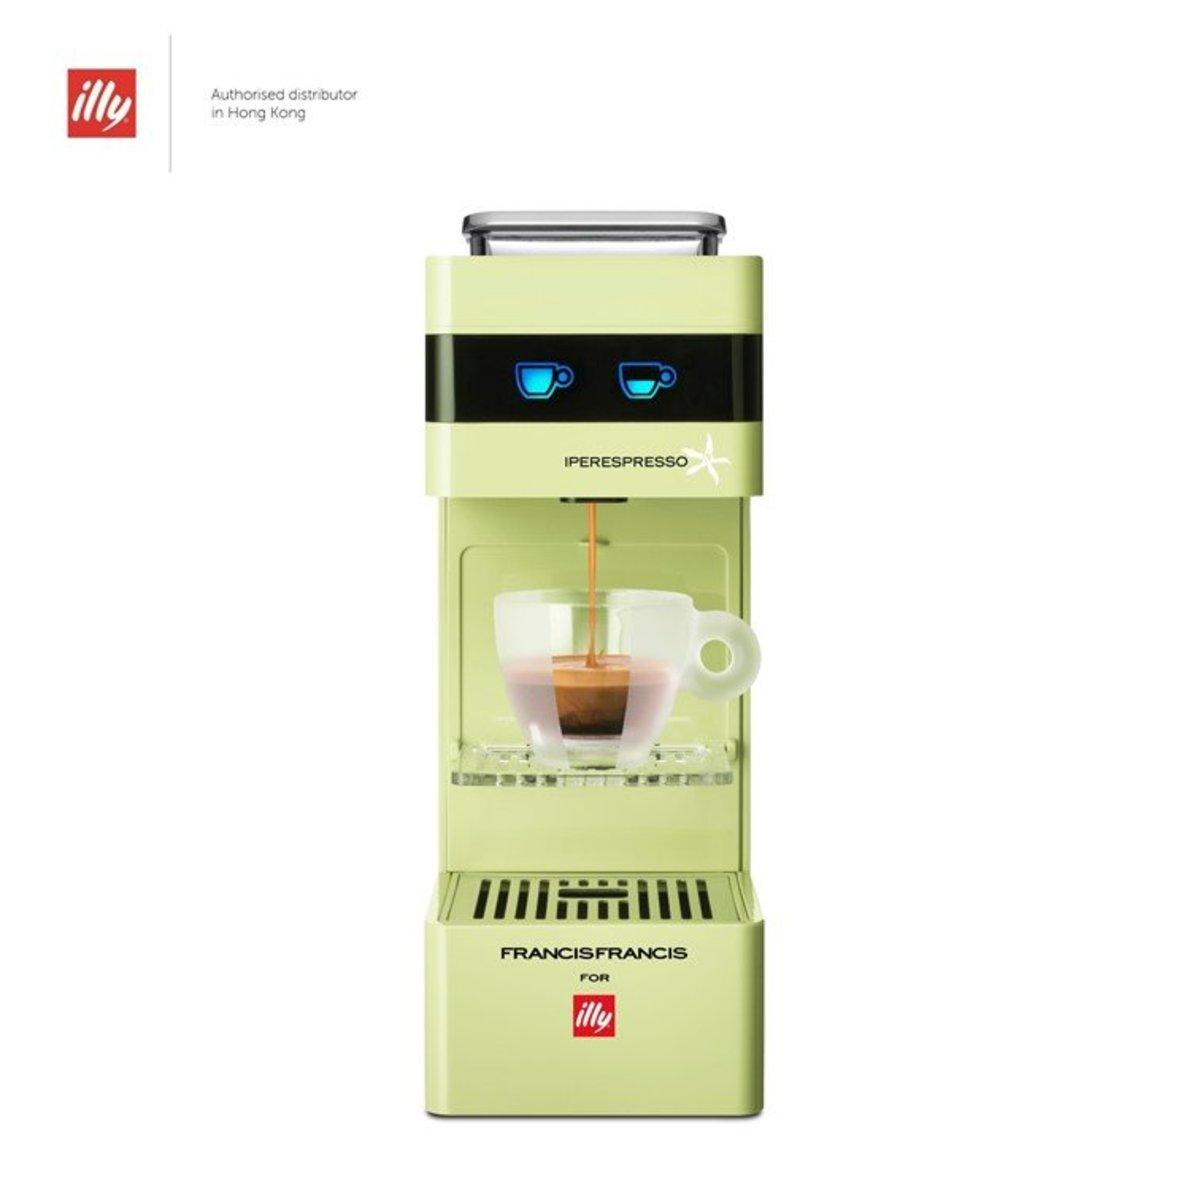 Y3A Iperespresso 家用特濃膠囊咖啡機 - 綠色